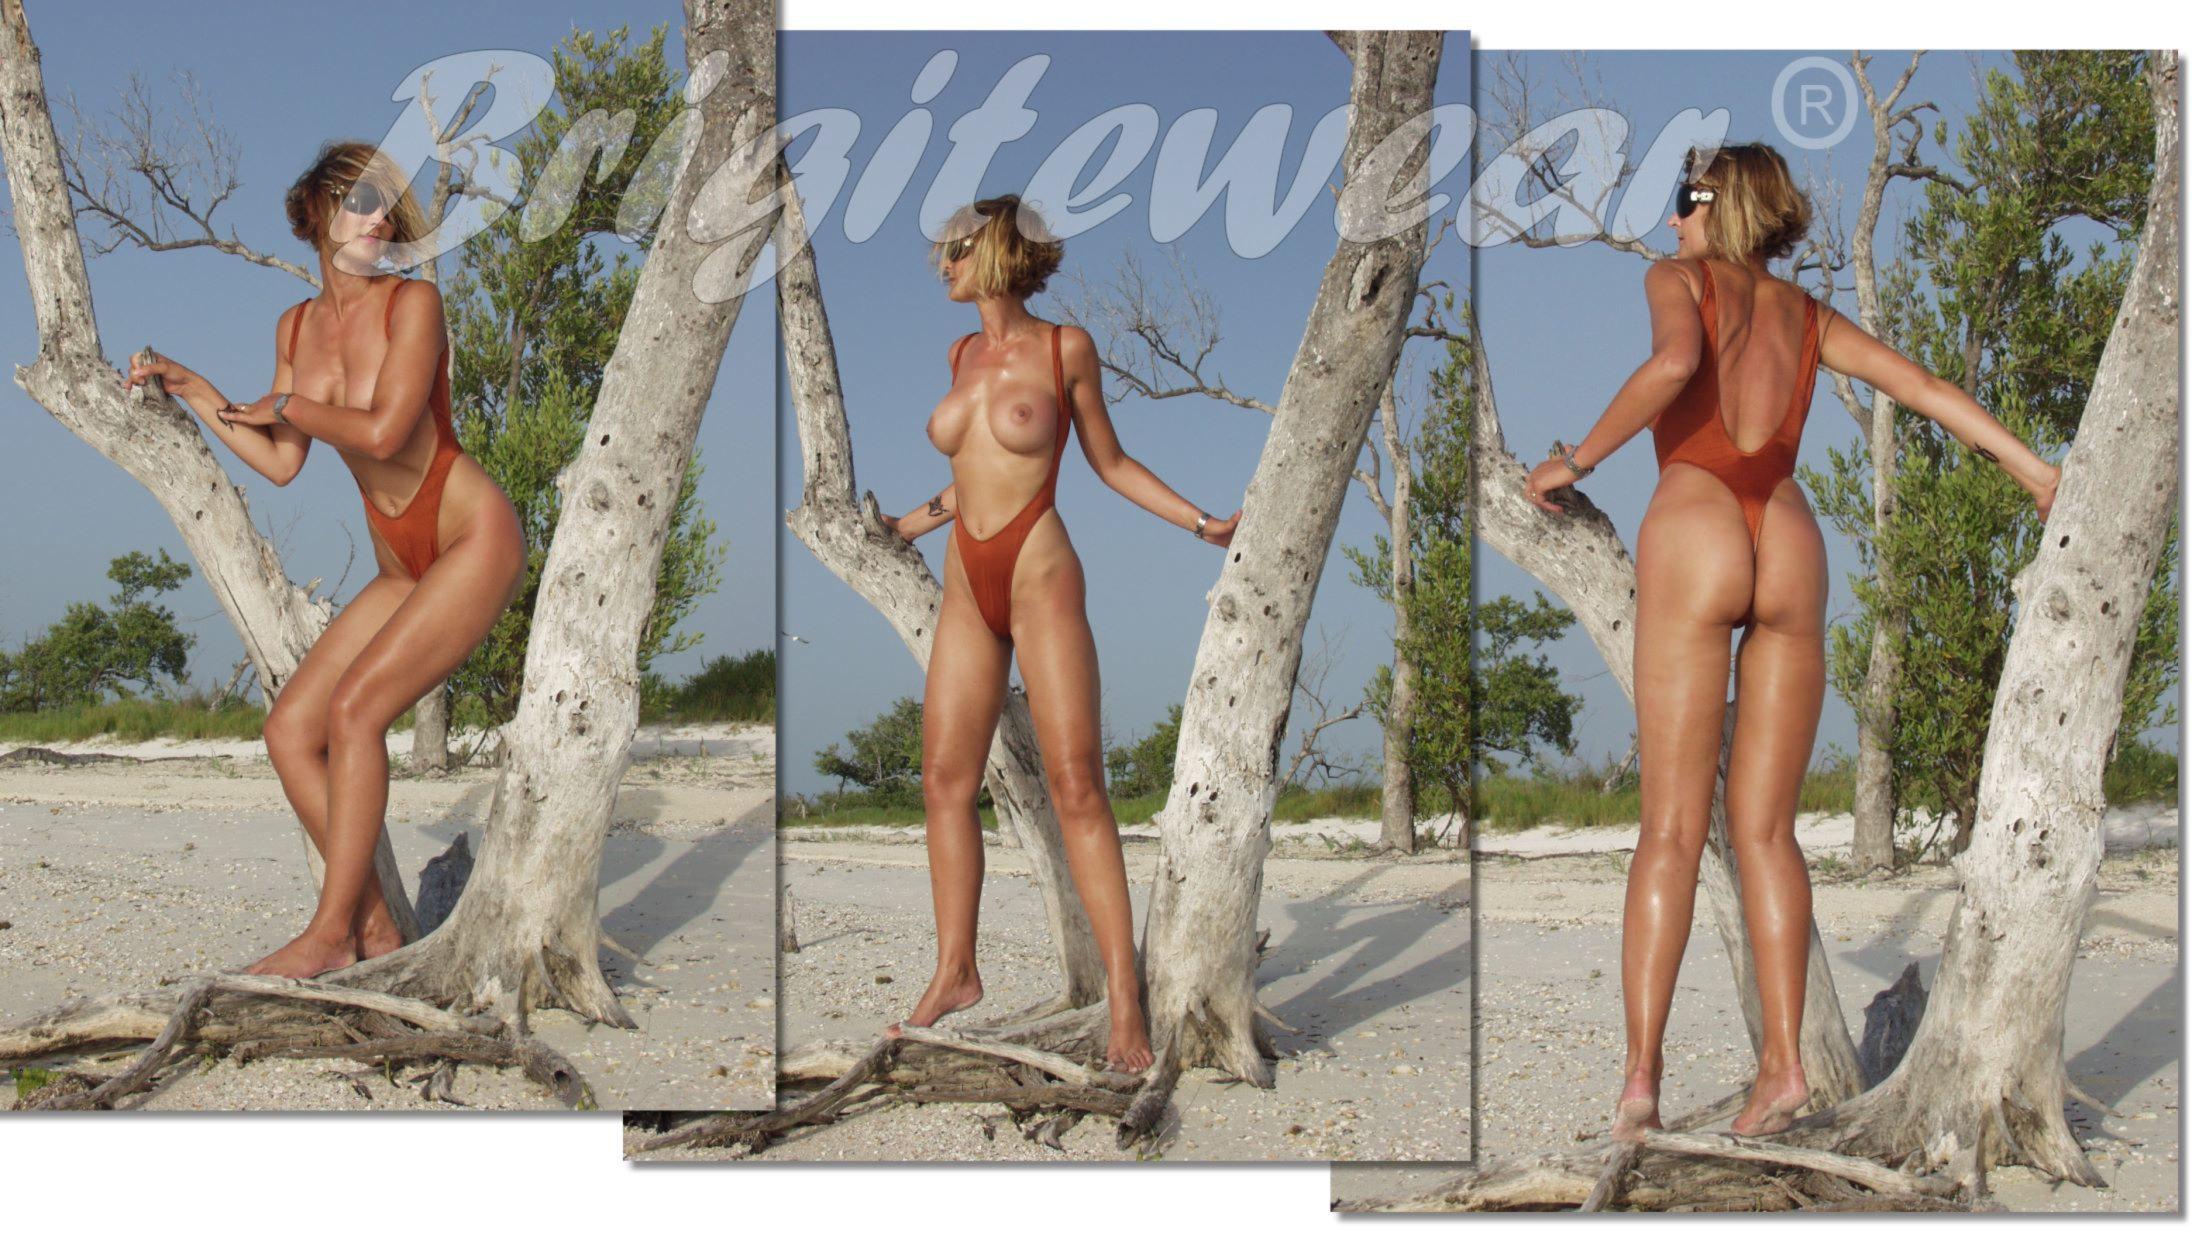 980cb3ff29e96 One piece topless swimwear for women Monte Carlo thong by Brigitewear